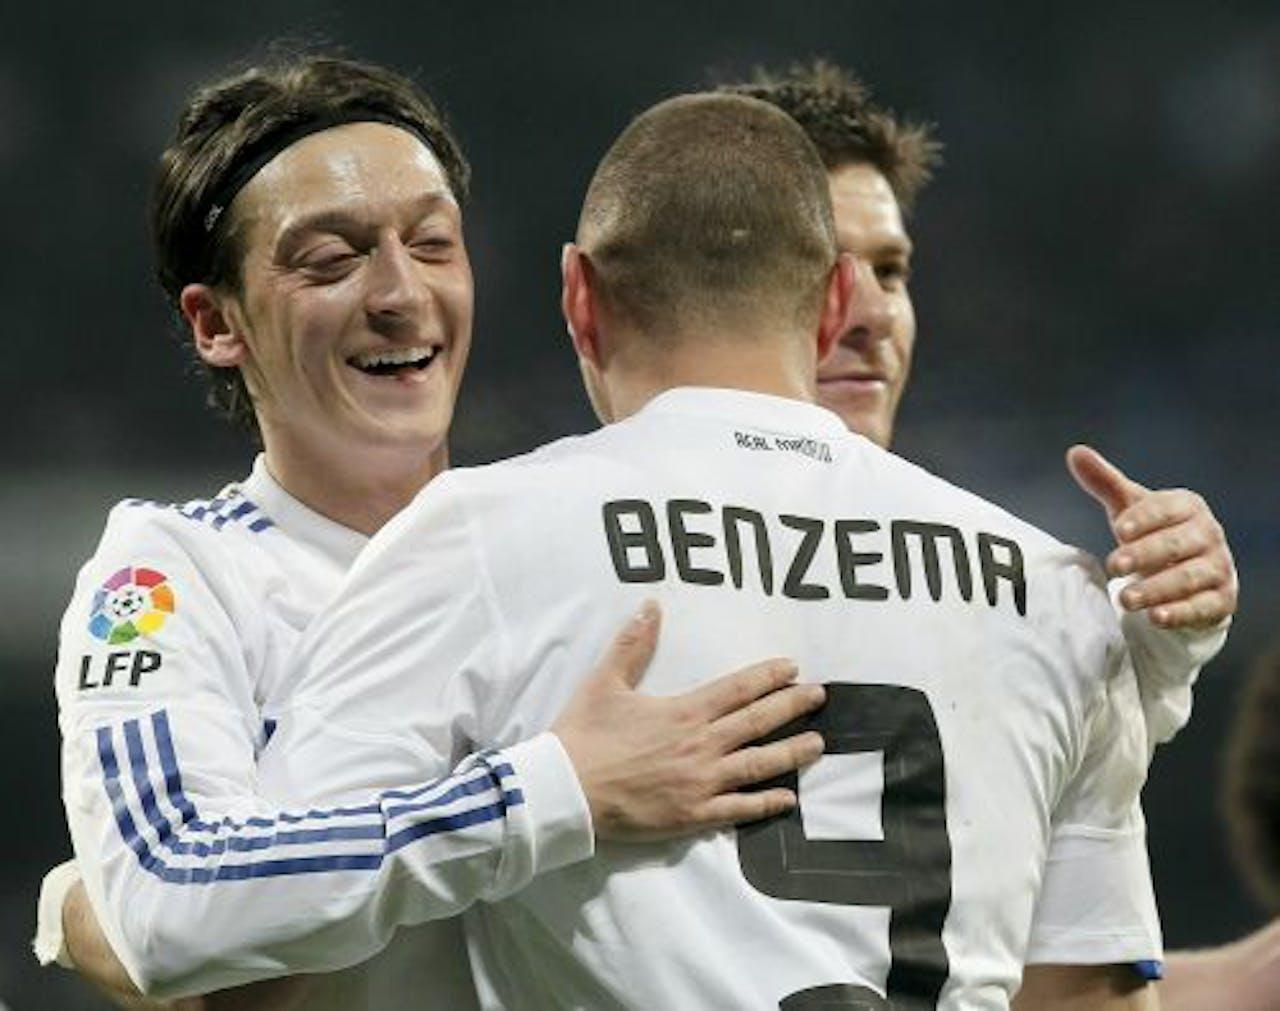 Vreugde bij spelers van Real Madrid, na het doelpunt van Karim Benzema. EPA